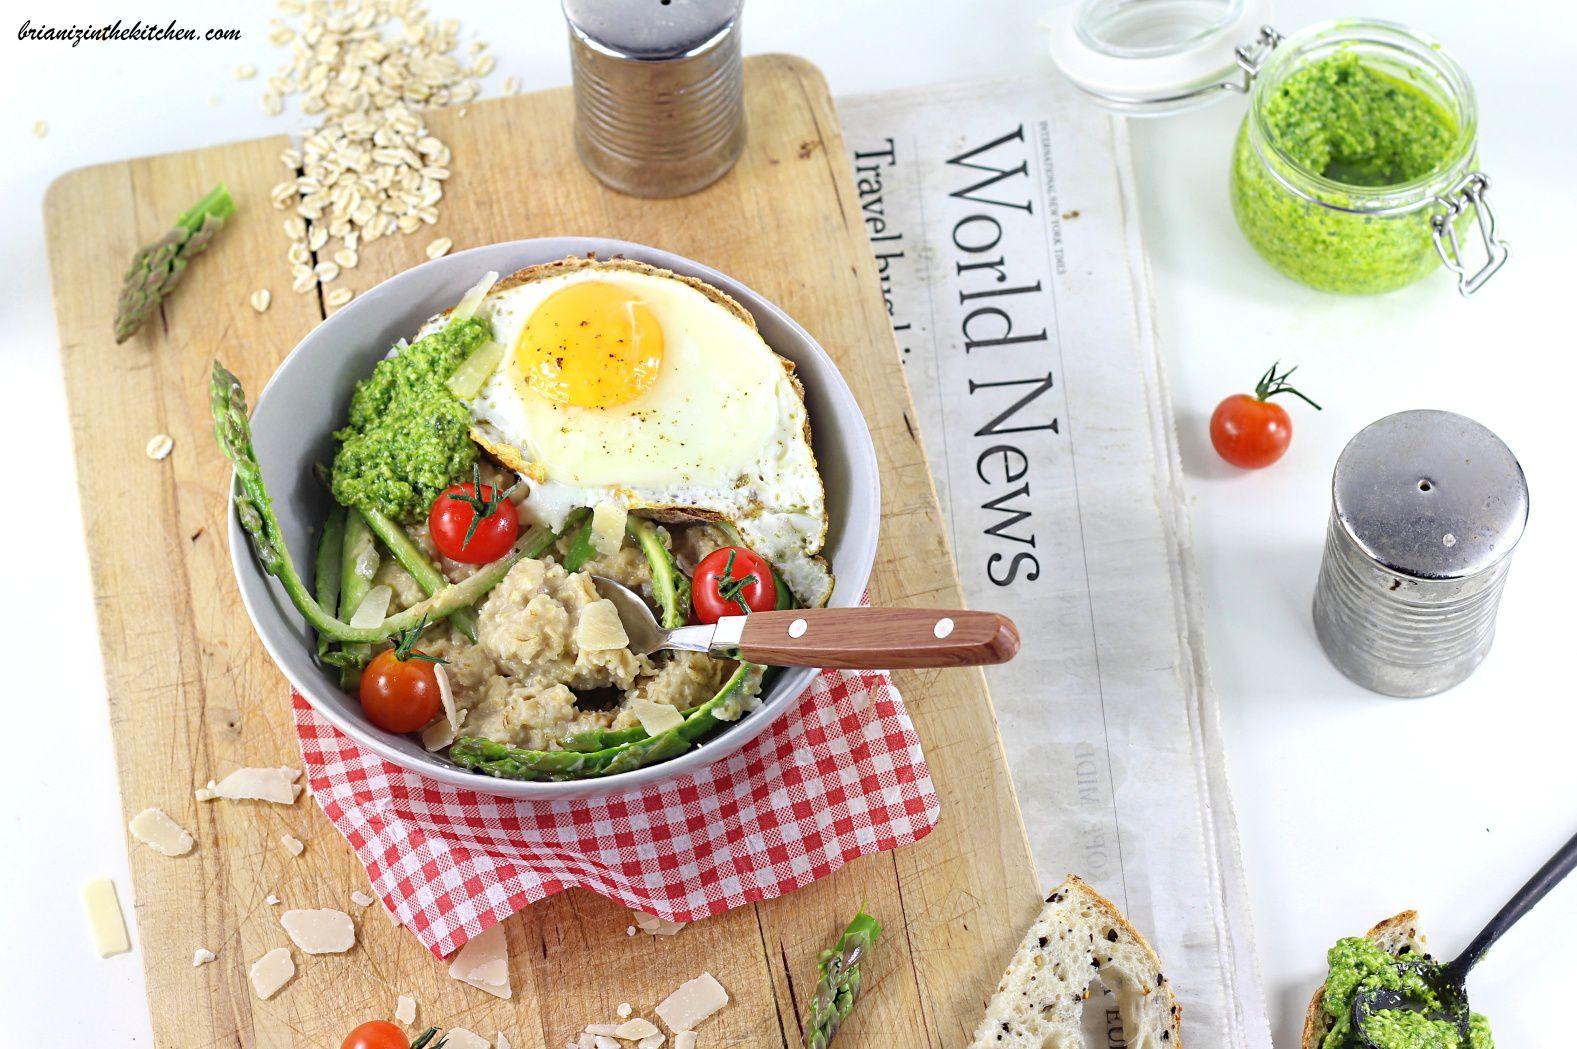 Porridge Salé Parmesan et Asperges Vertes - Brian Iz In The